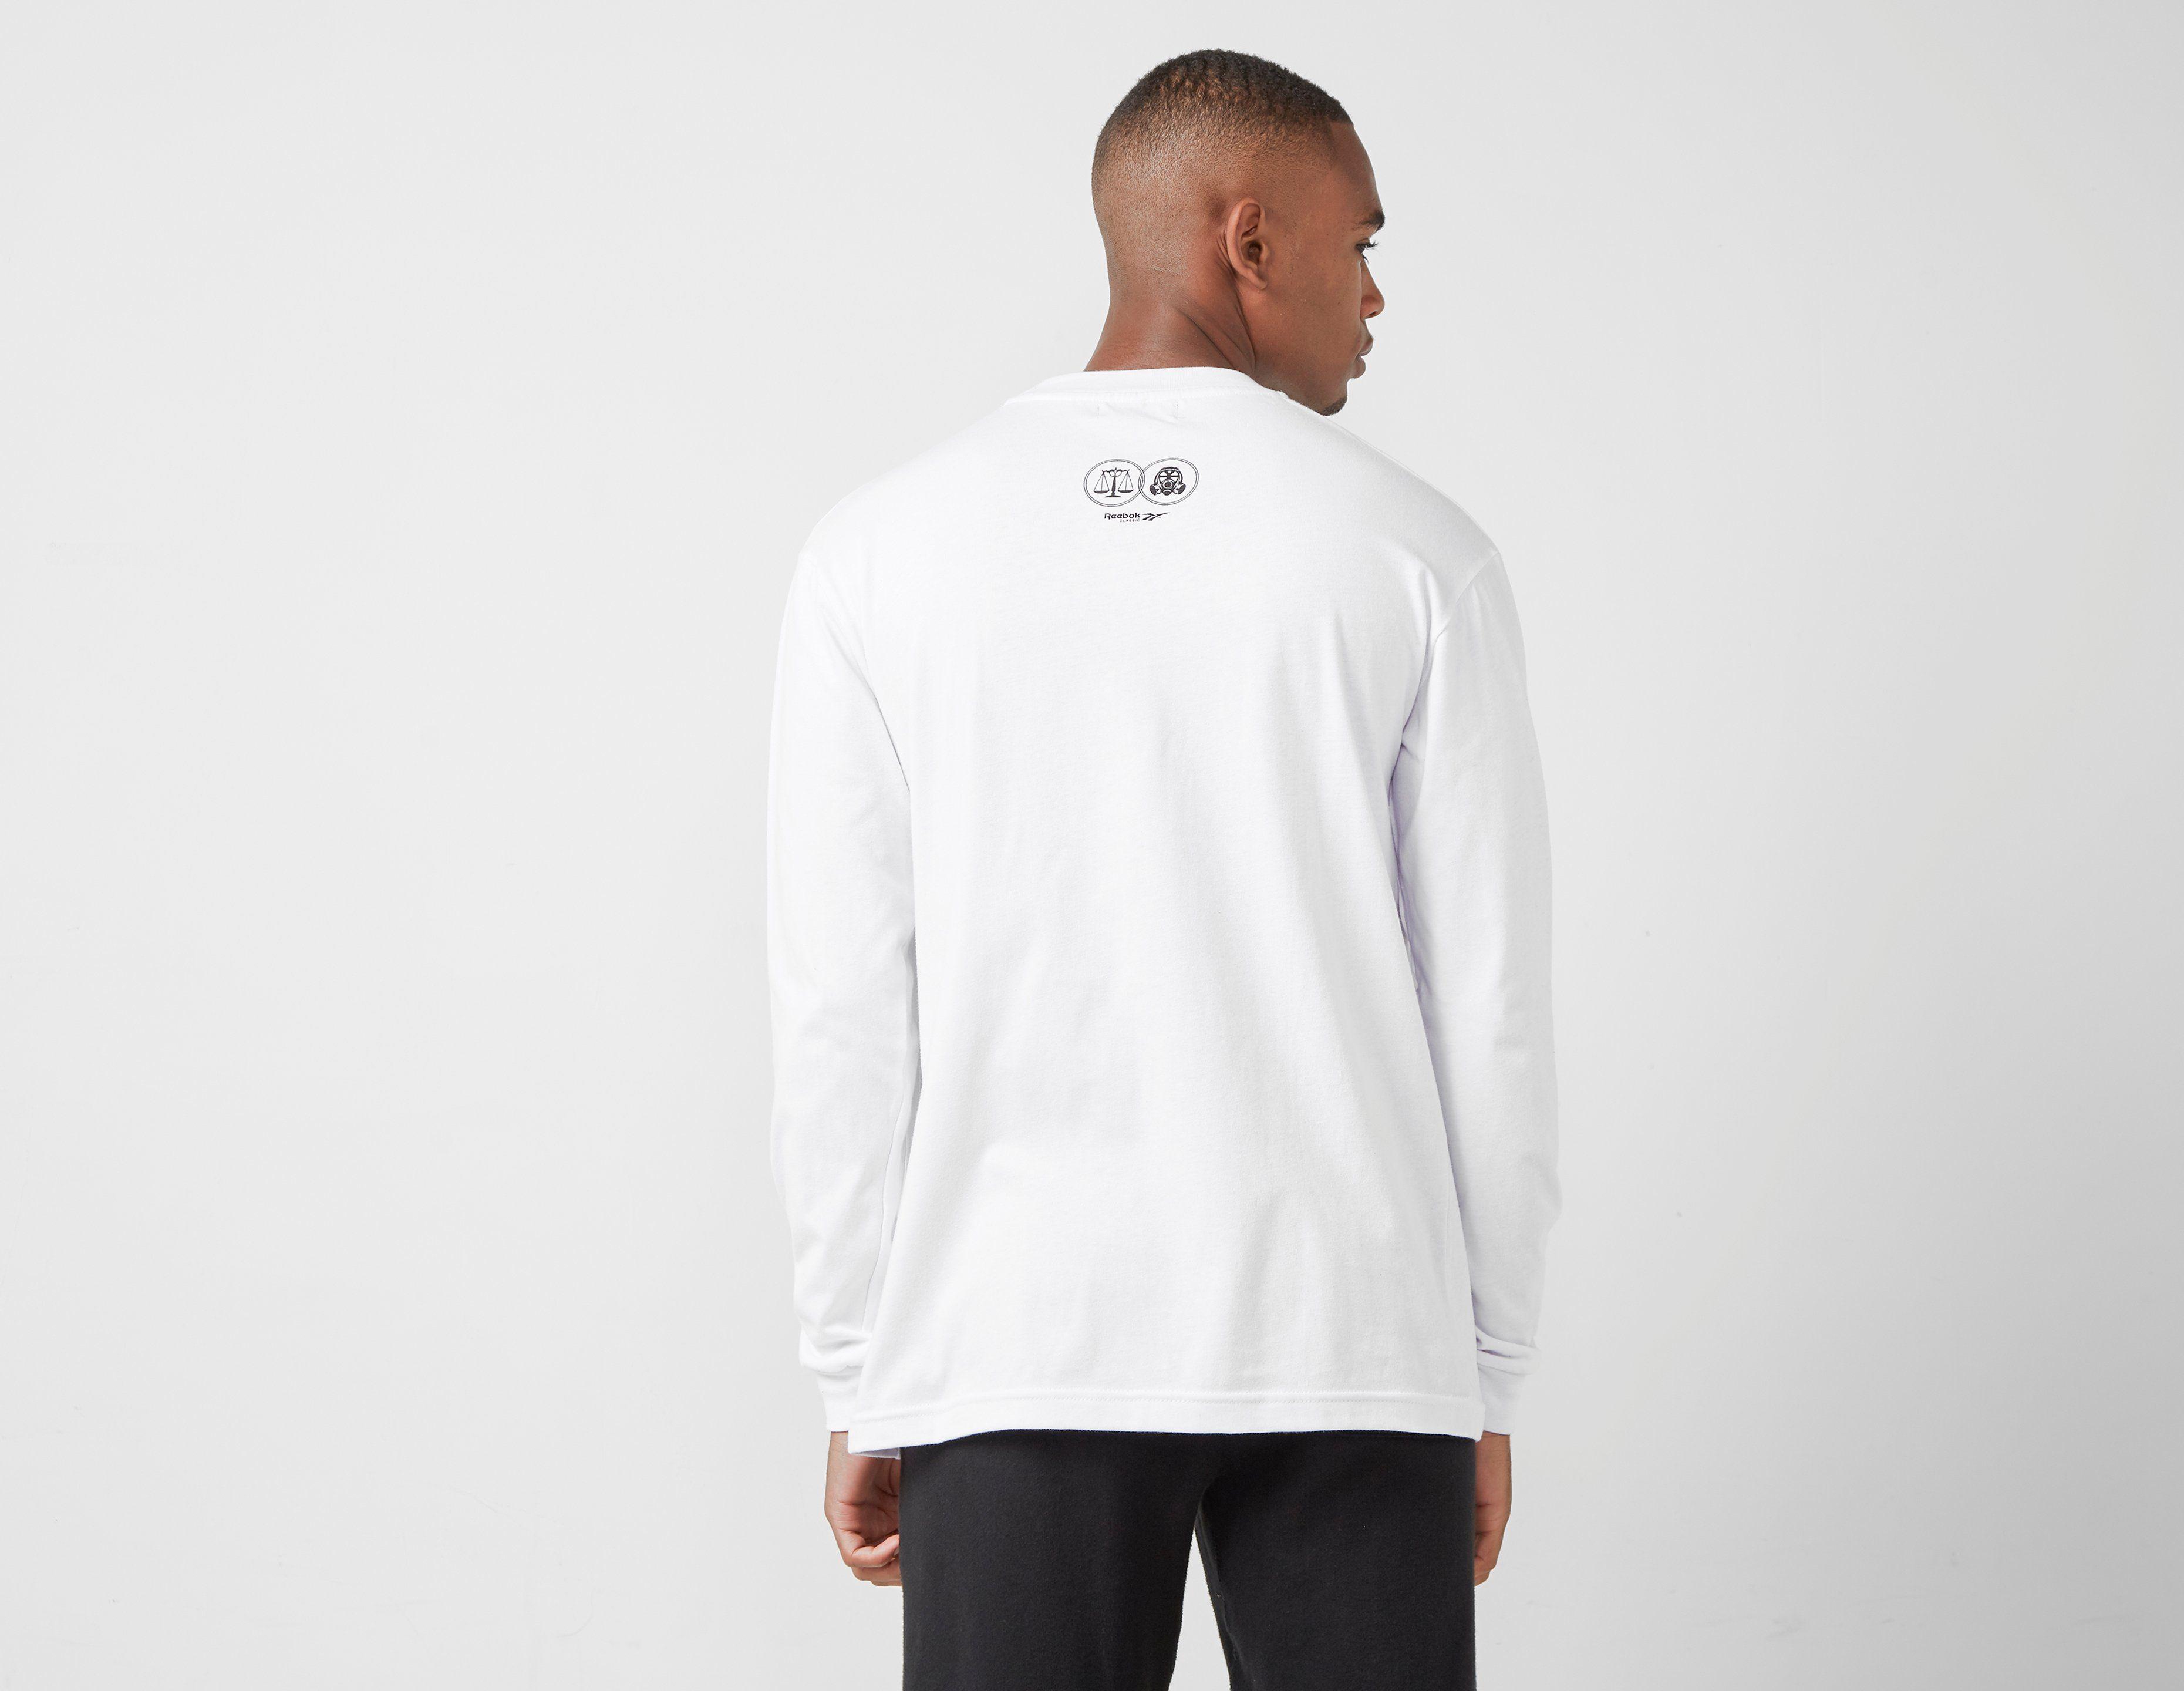 Footpatrol x Highs and Lows x Reebok 'Rave' T-Shirt